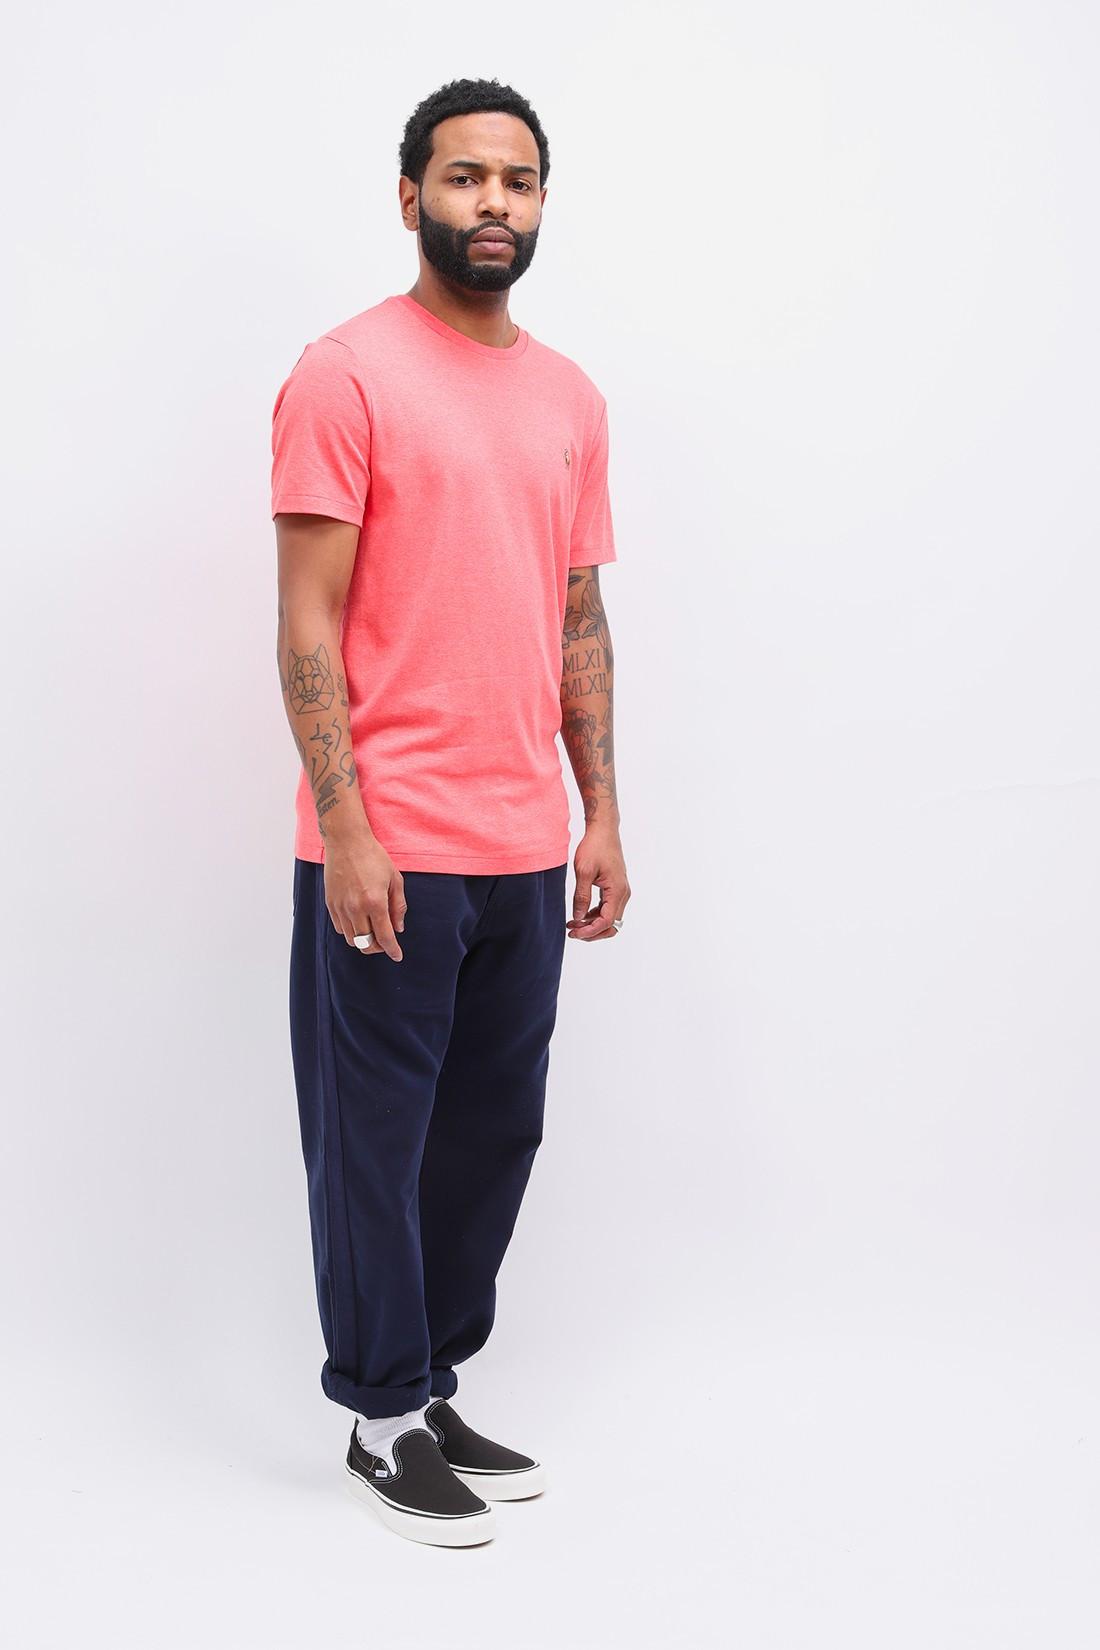 POLO RALPH LAUREN / Custom slim fit tee shirt Pink heather